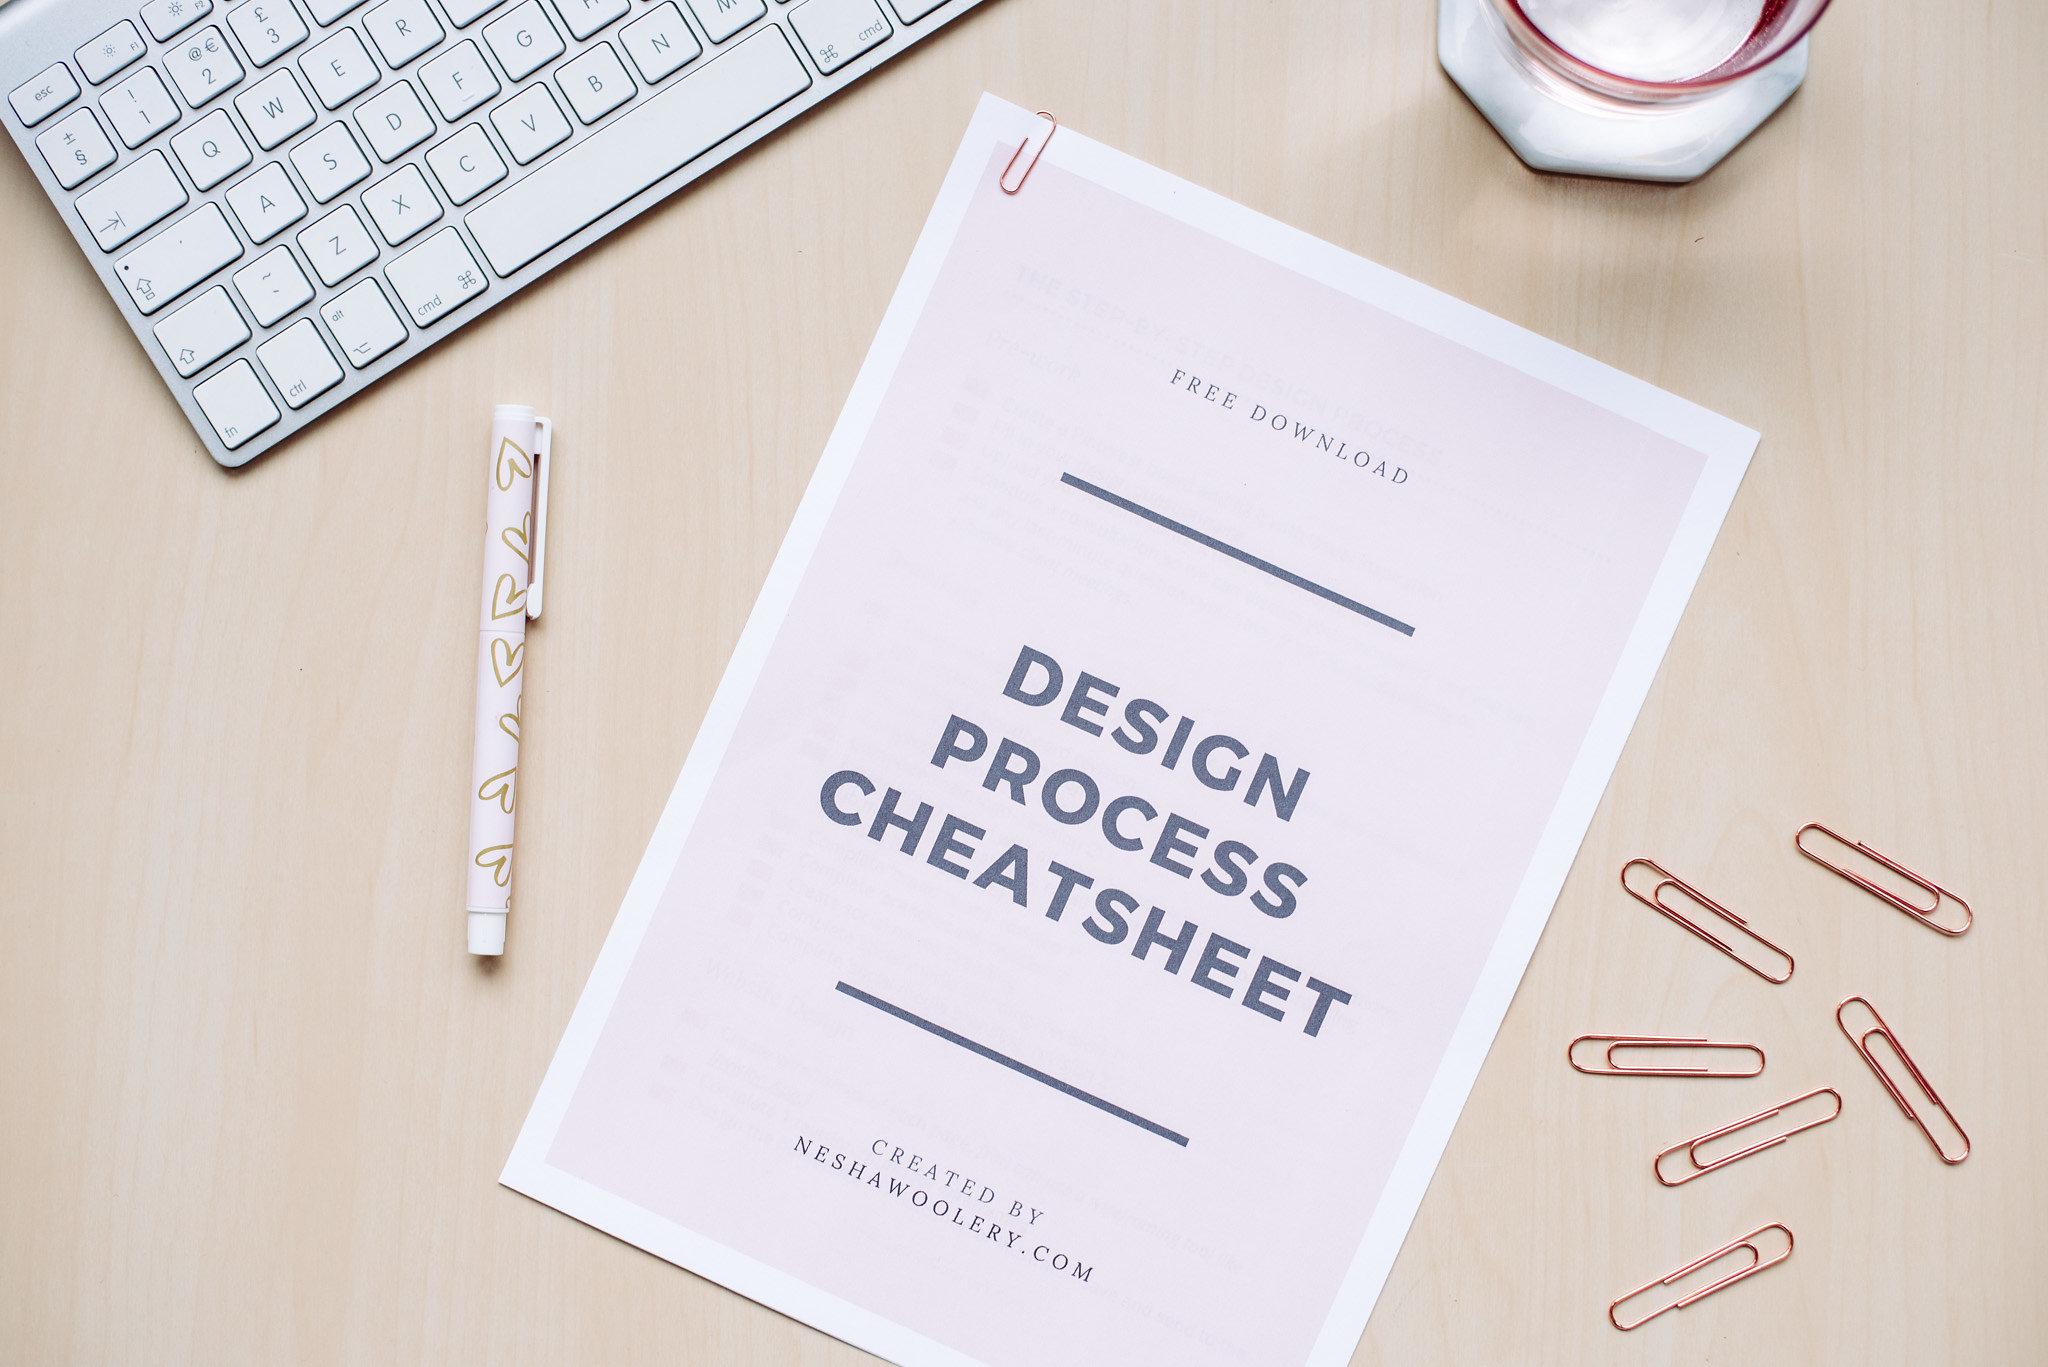 Nesha-Woolery-Business-Mentor-Designers-Web-101.jpg